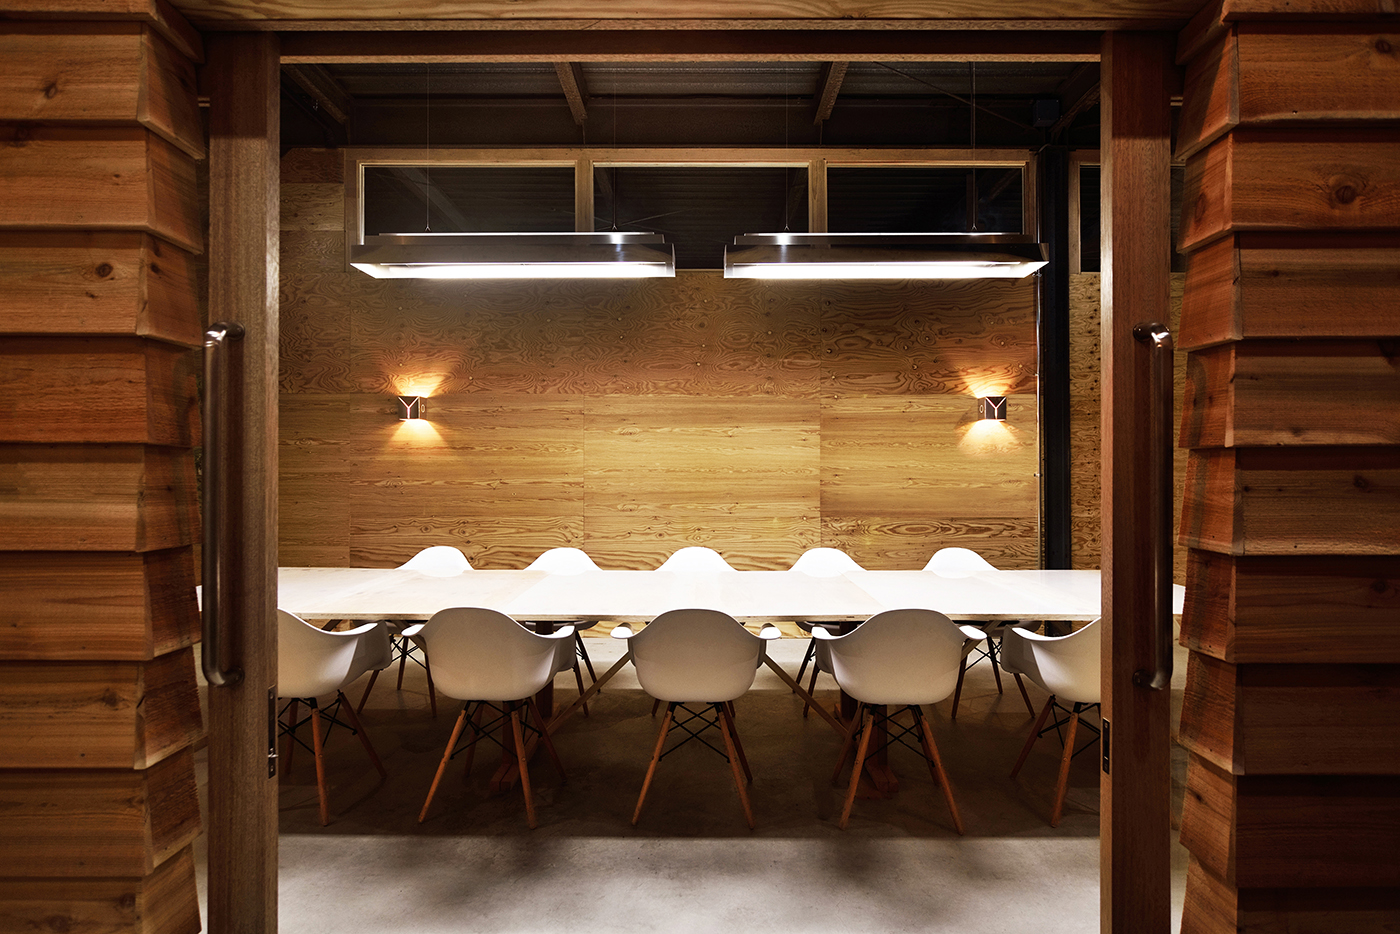 BoundAboutProject、オフィス、工場リノベーション、内装デザイン、神奈川、綾瀬、一級建築士事務所、建築家、インダストリアル、マイセット、針葉樹合板、レッドシダー、下見張り、エアロコンセプト、特注の照明器具